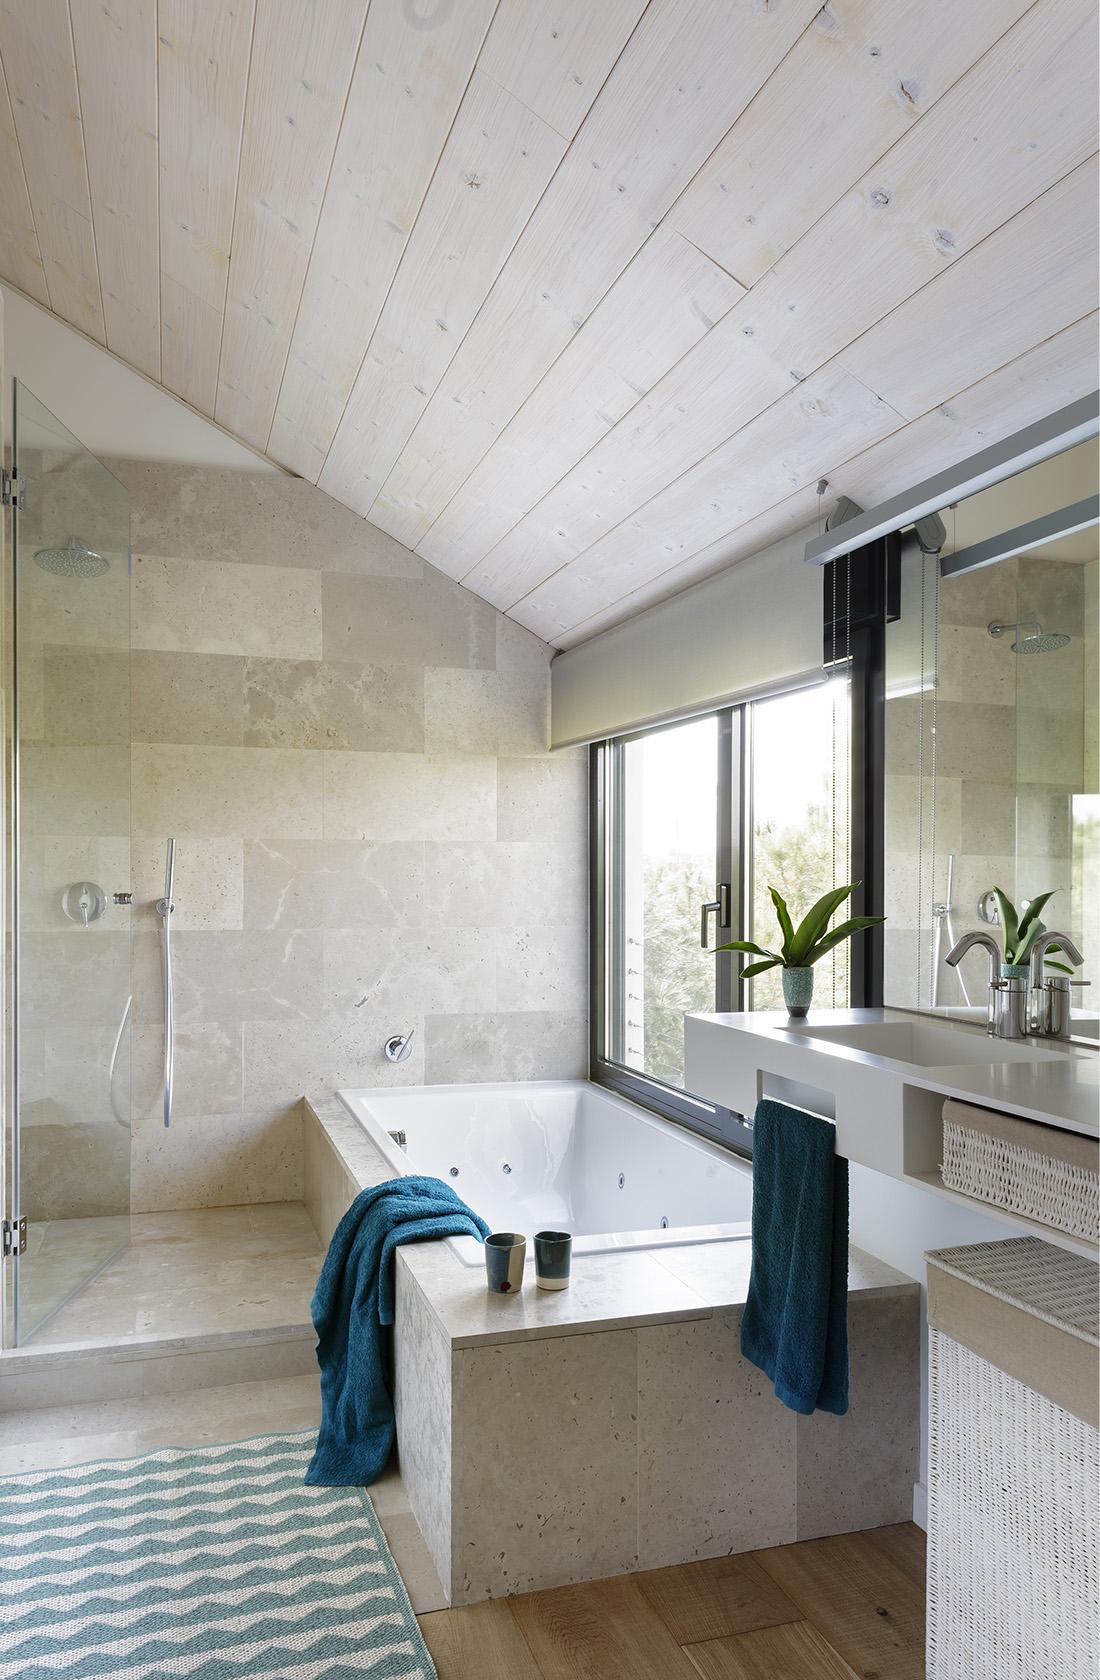 Baño principal de Casa XY, Arquitectura en madera